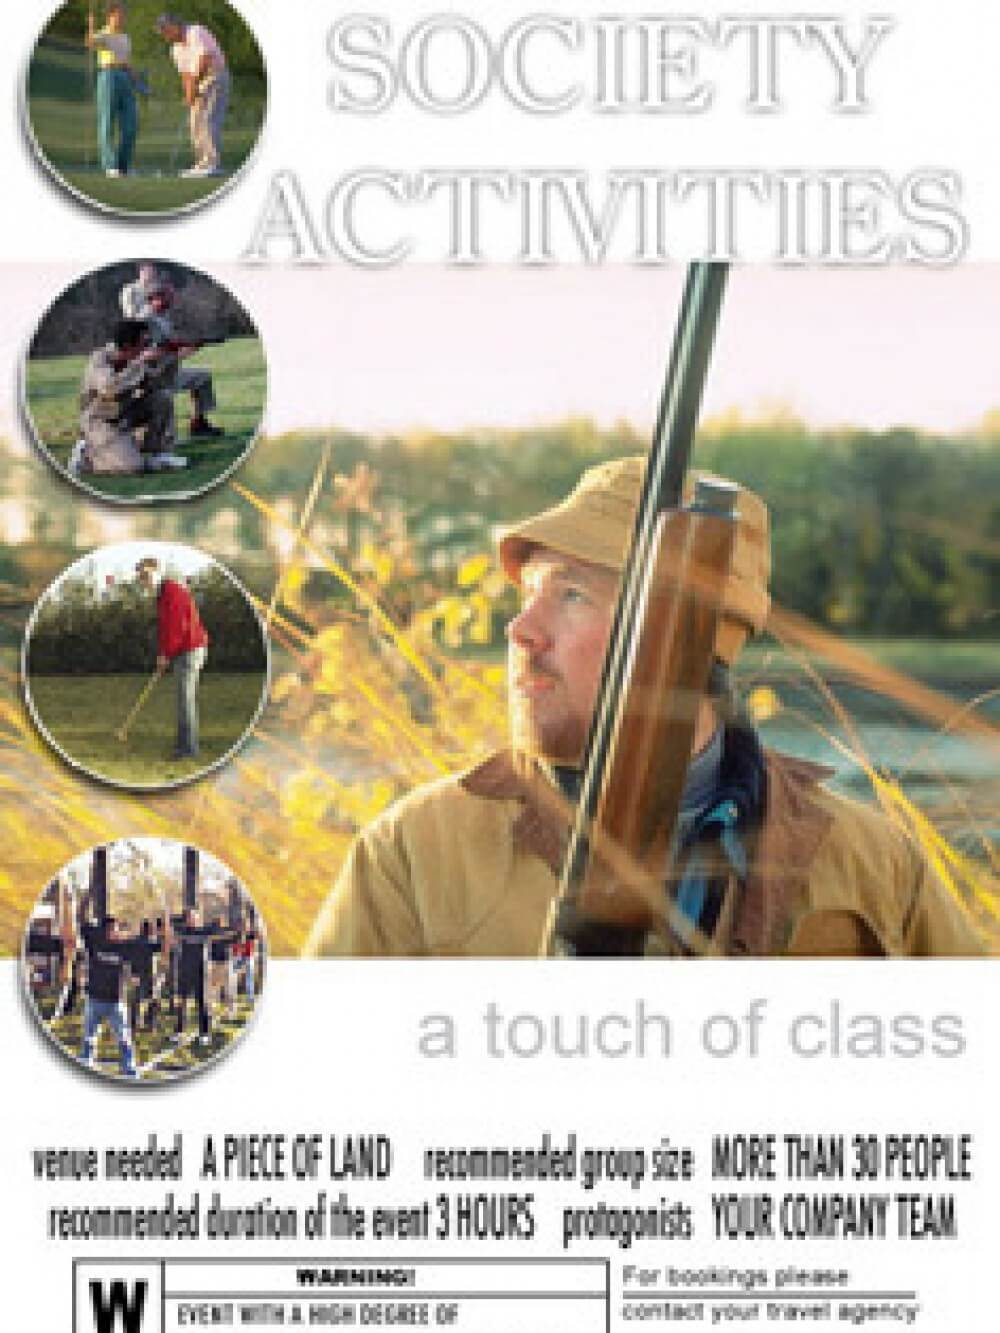 society_activities_vertical_web